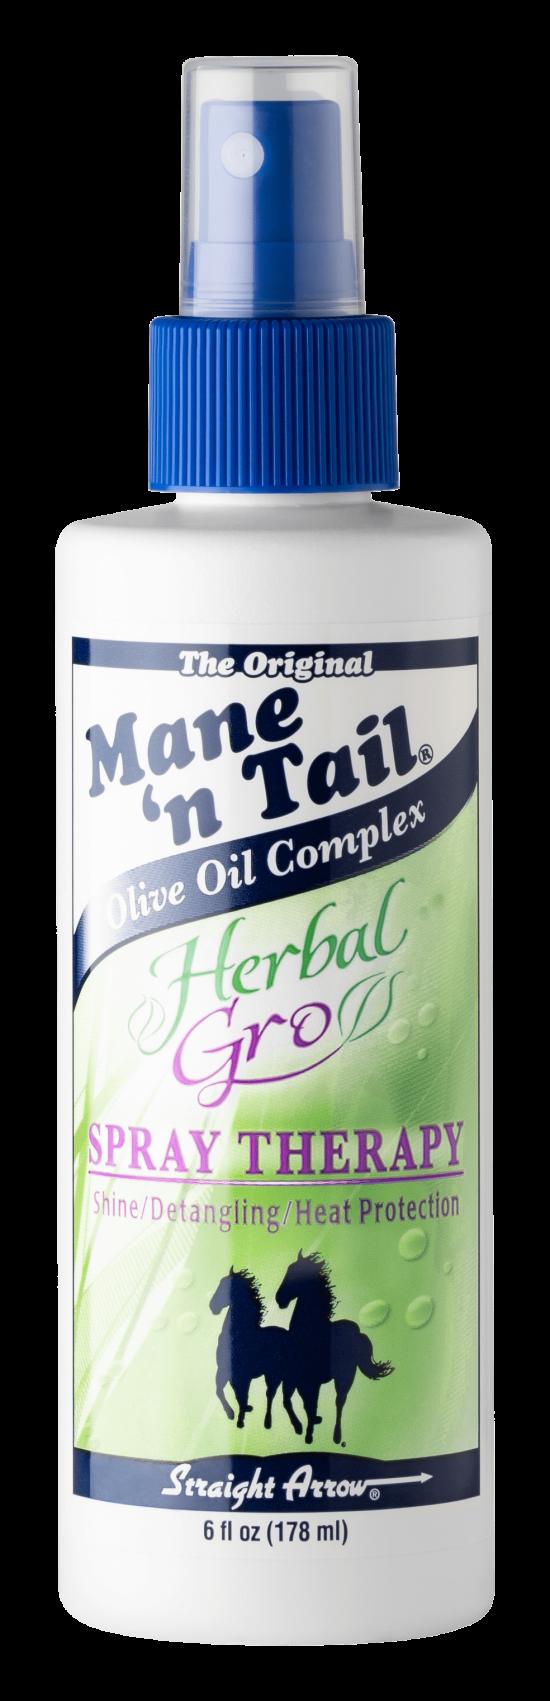 Herbal Gro Spray Therapy 6 oz spray bottle